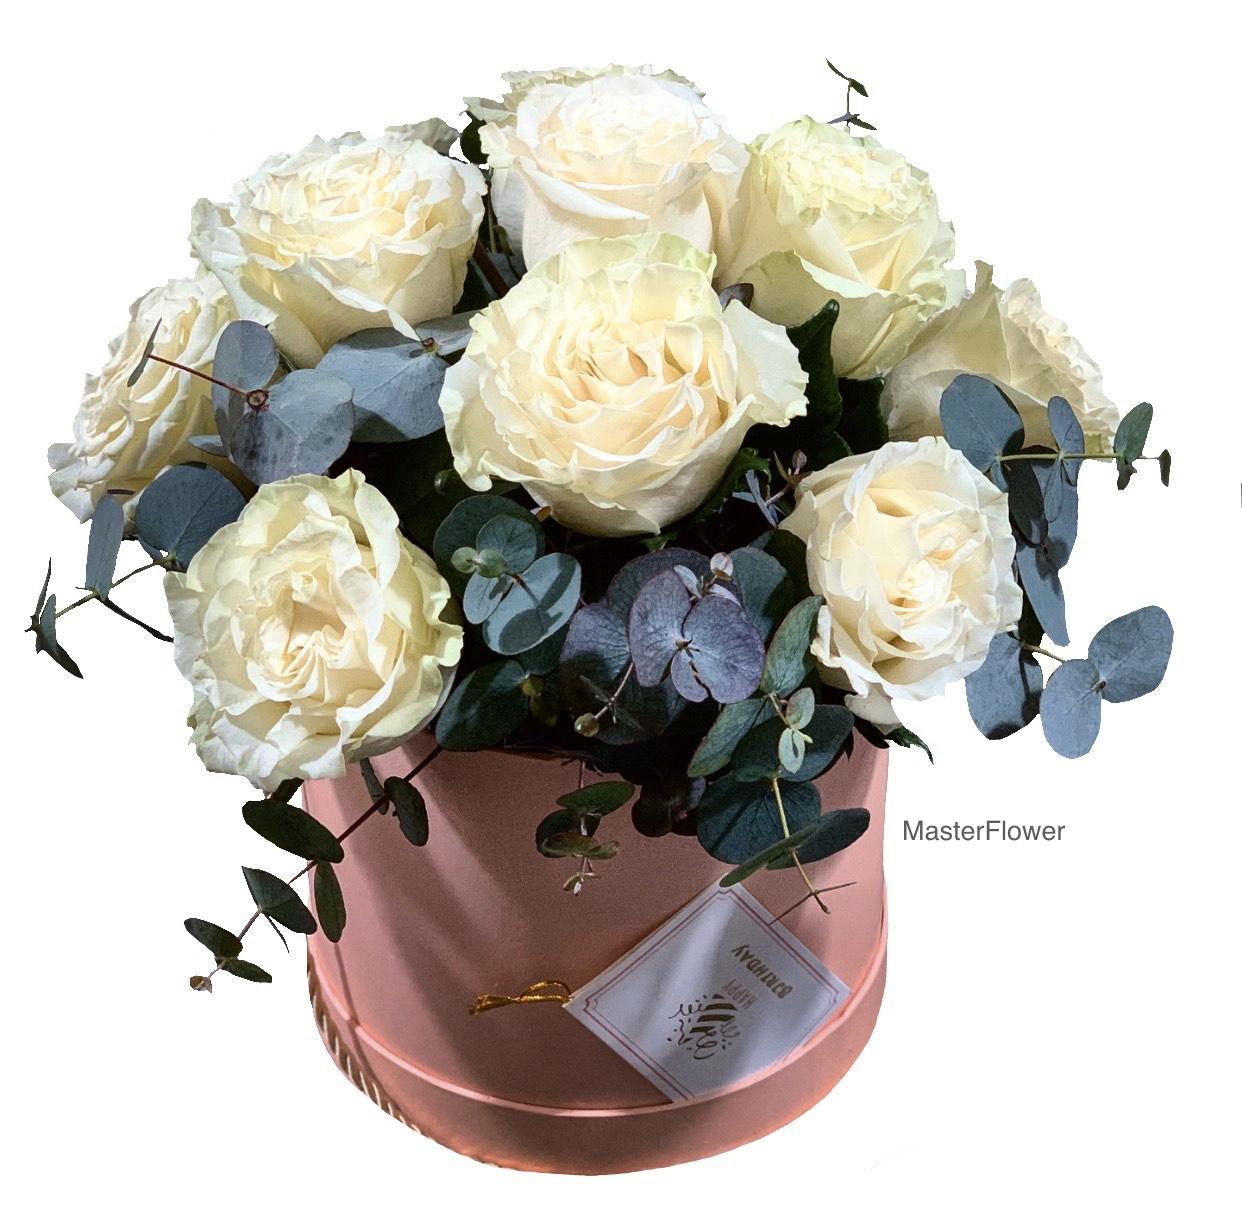 Aranjament floral mixt cu trandafiri albi